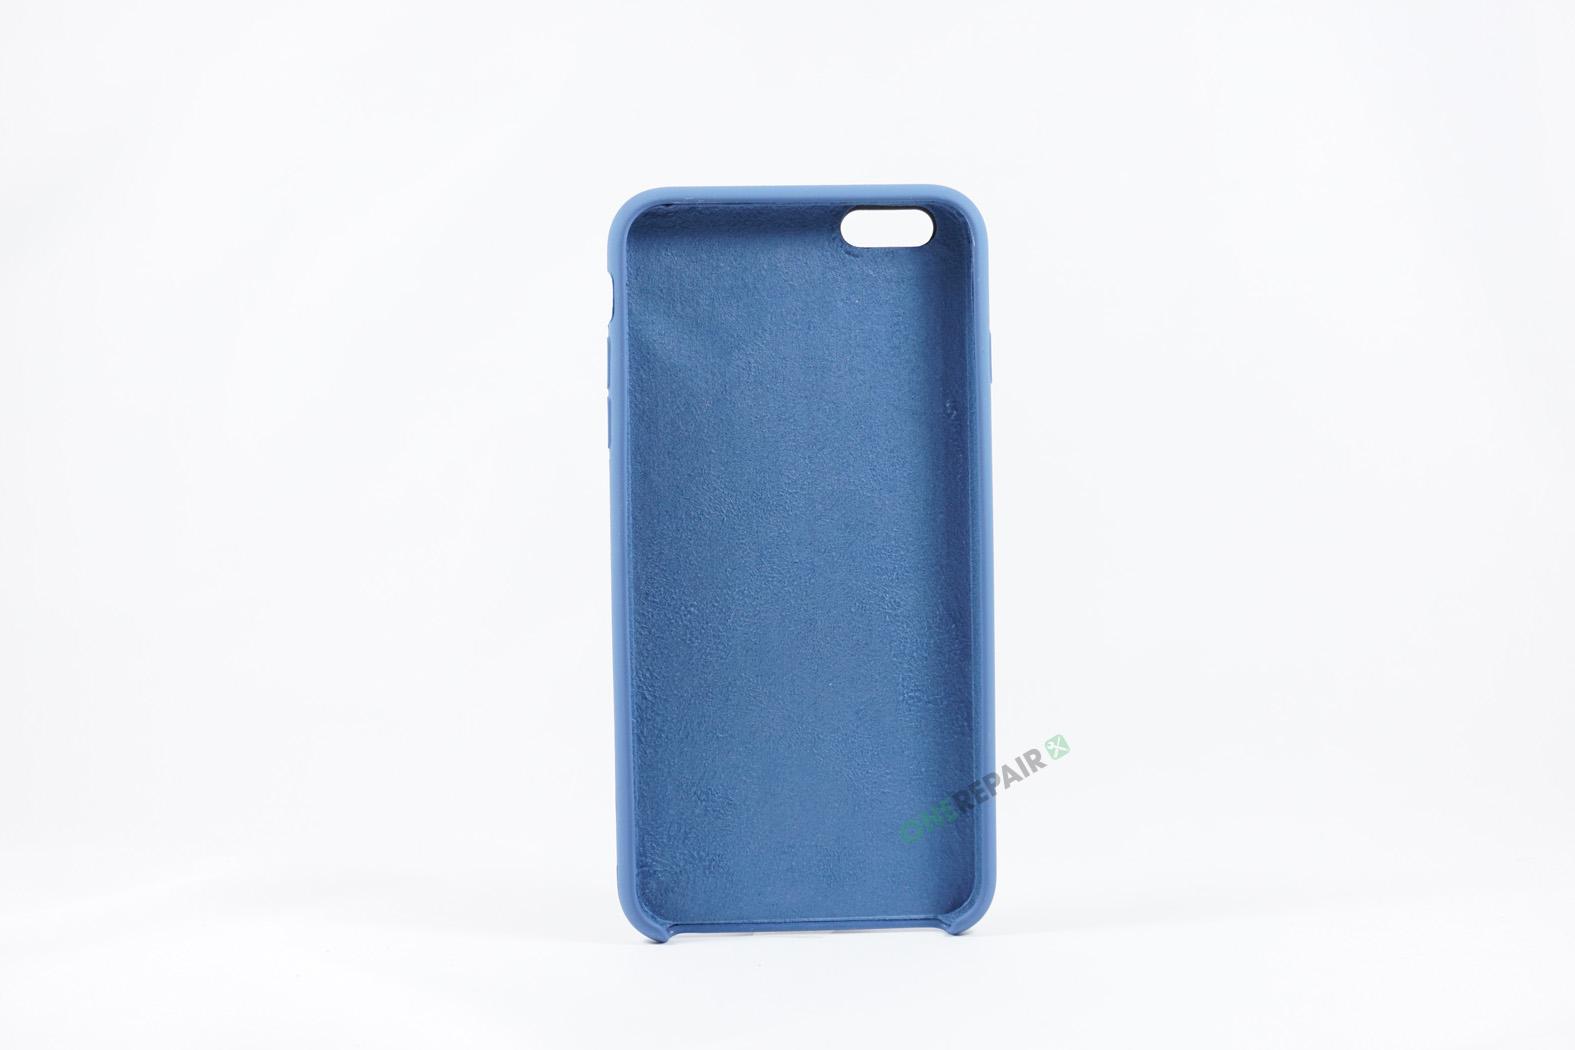 351432_iPhone_6+_6S+_Plus_Silikone_Cover_Blaa_OneRepair_WM_00003